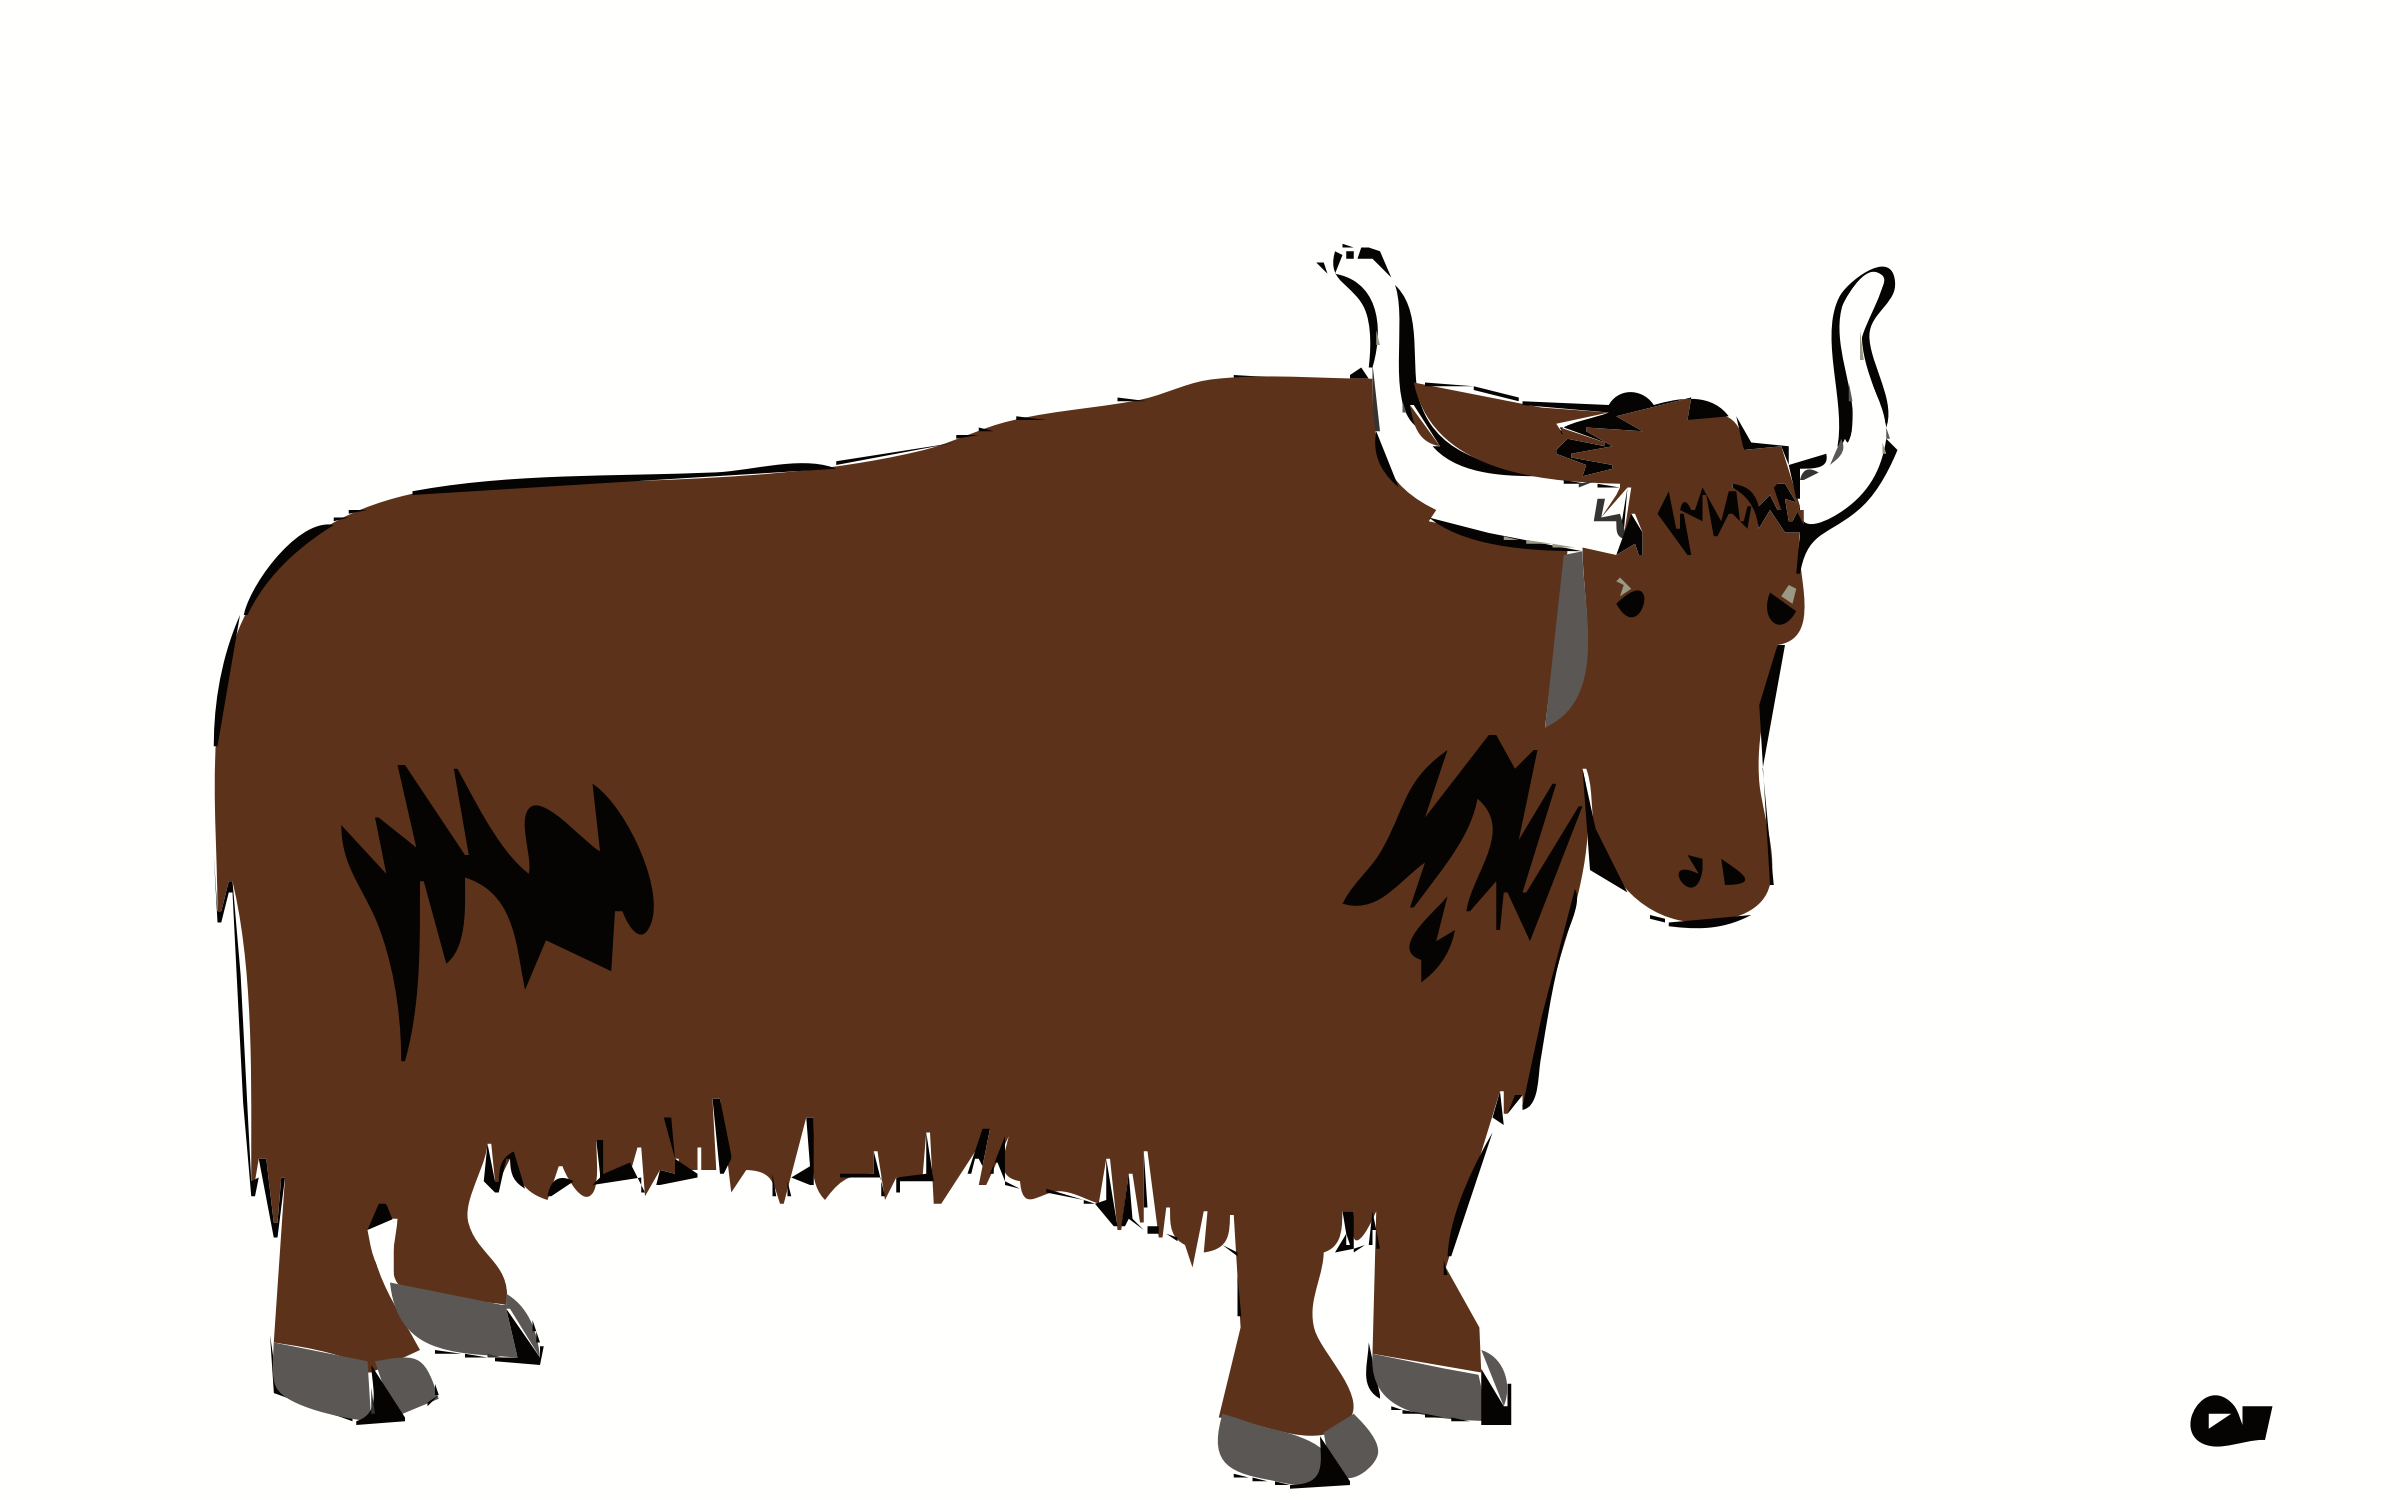 Yak Animal Png - Big Image (Png), Transparent background PNG HD thumbnail